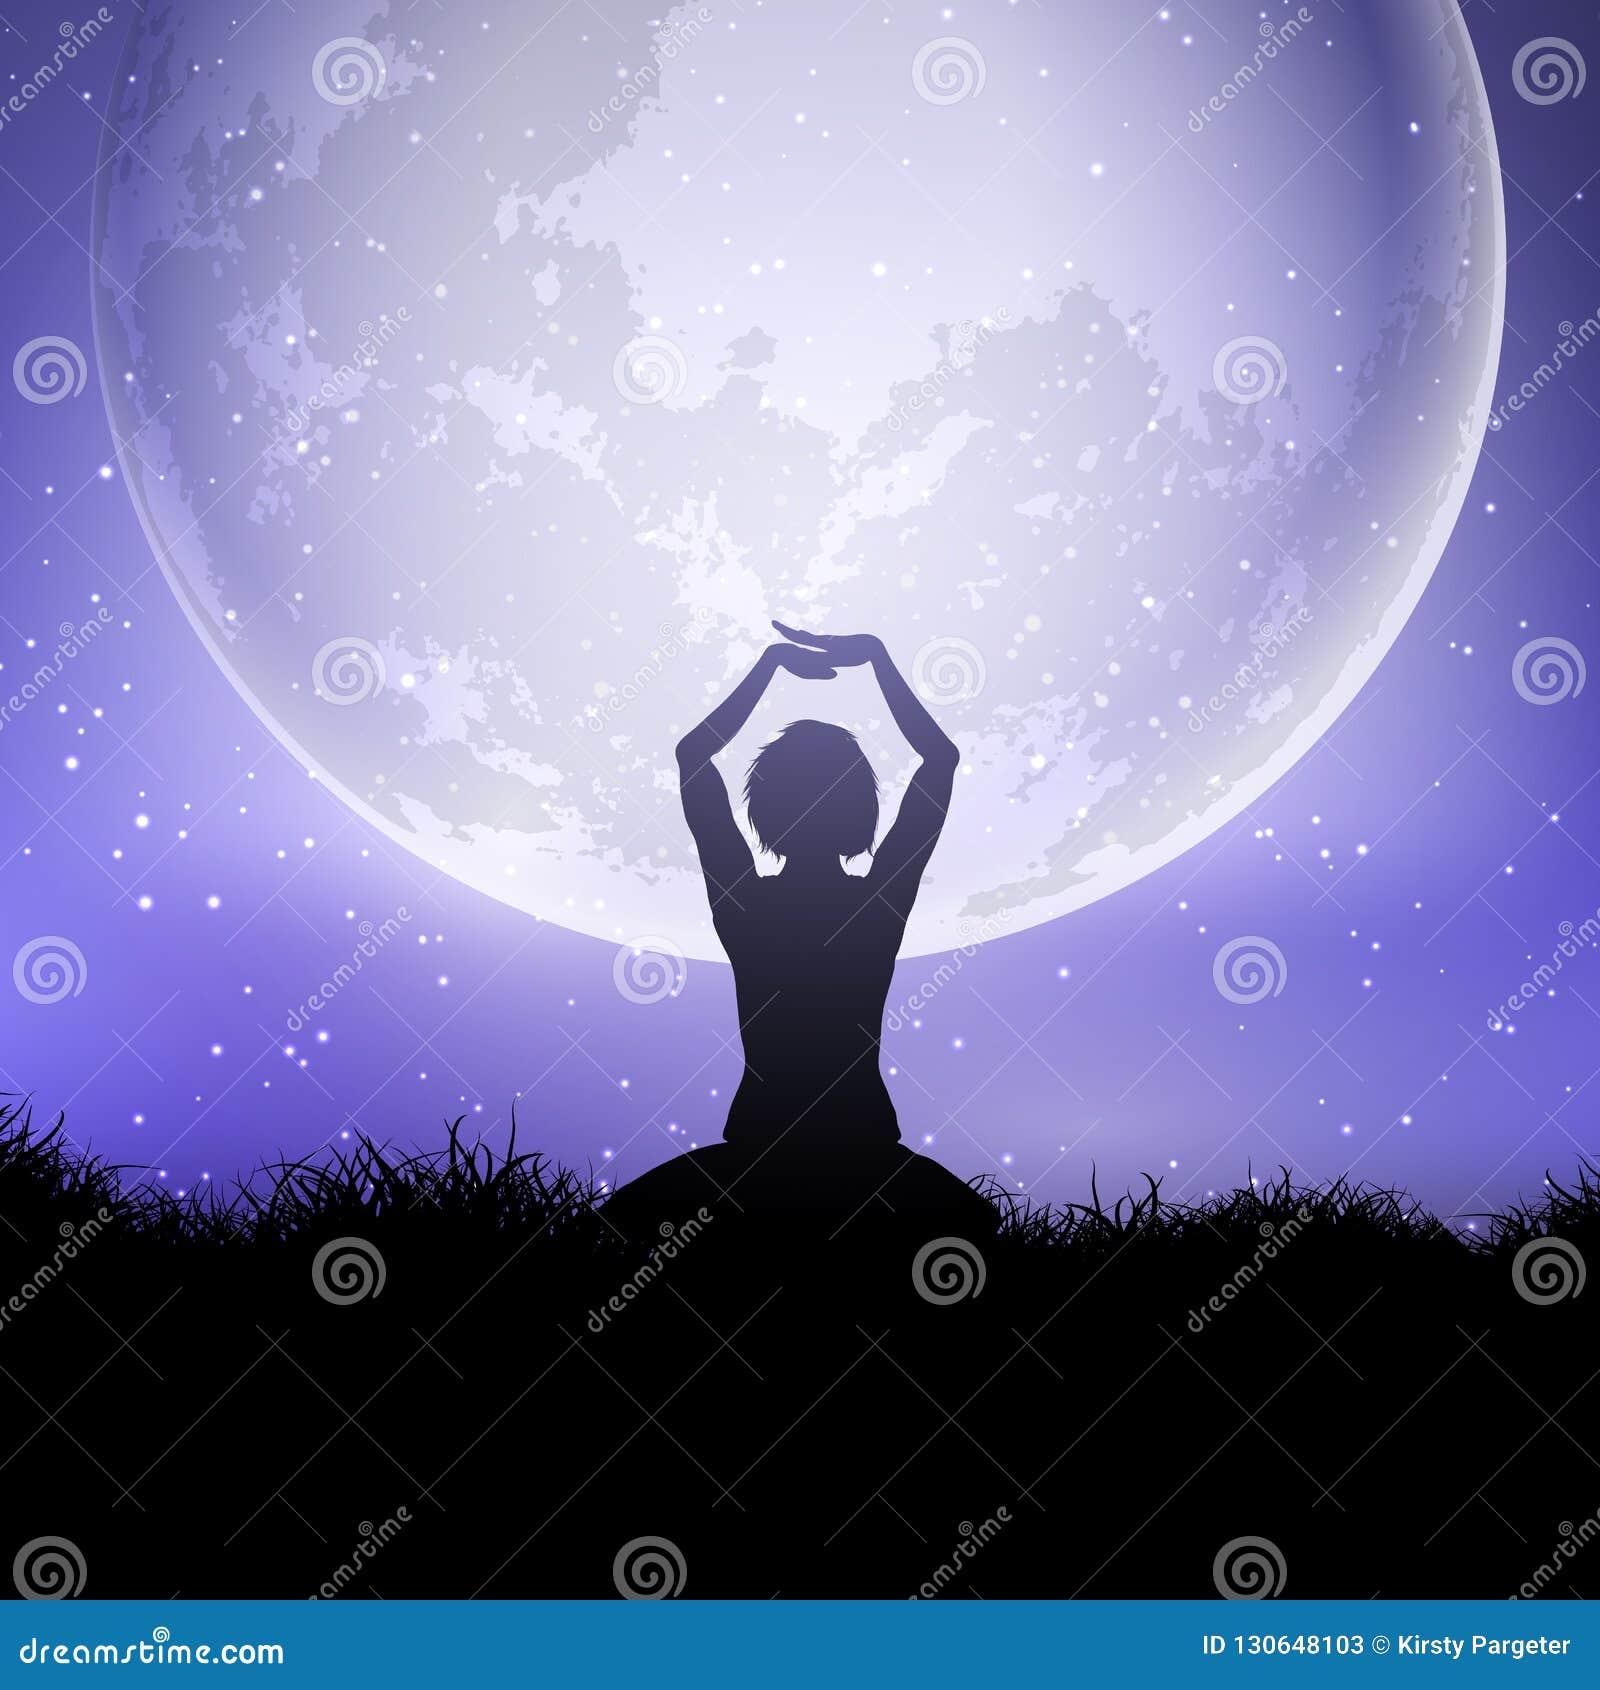 Female in yoga pose against a moonlit sky